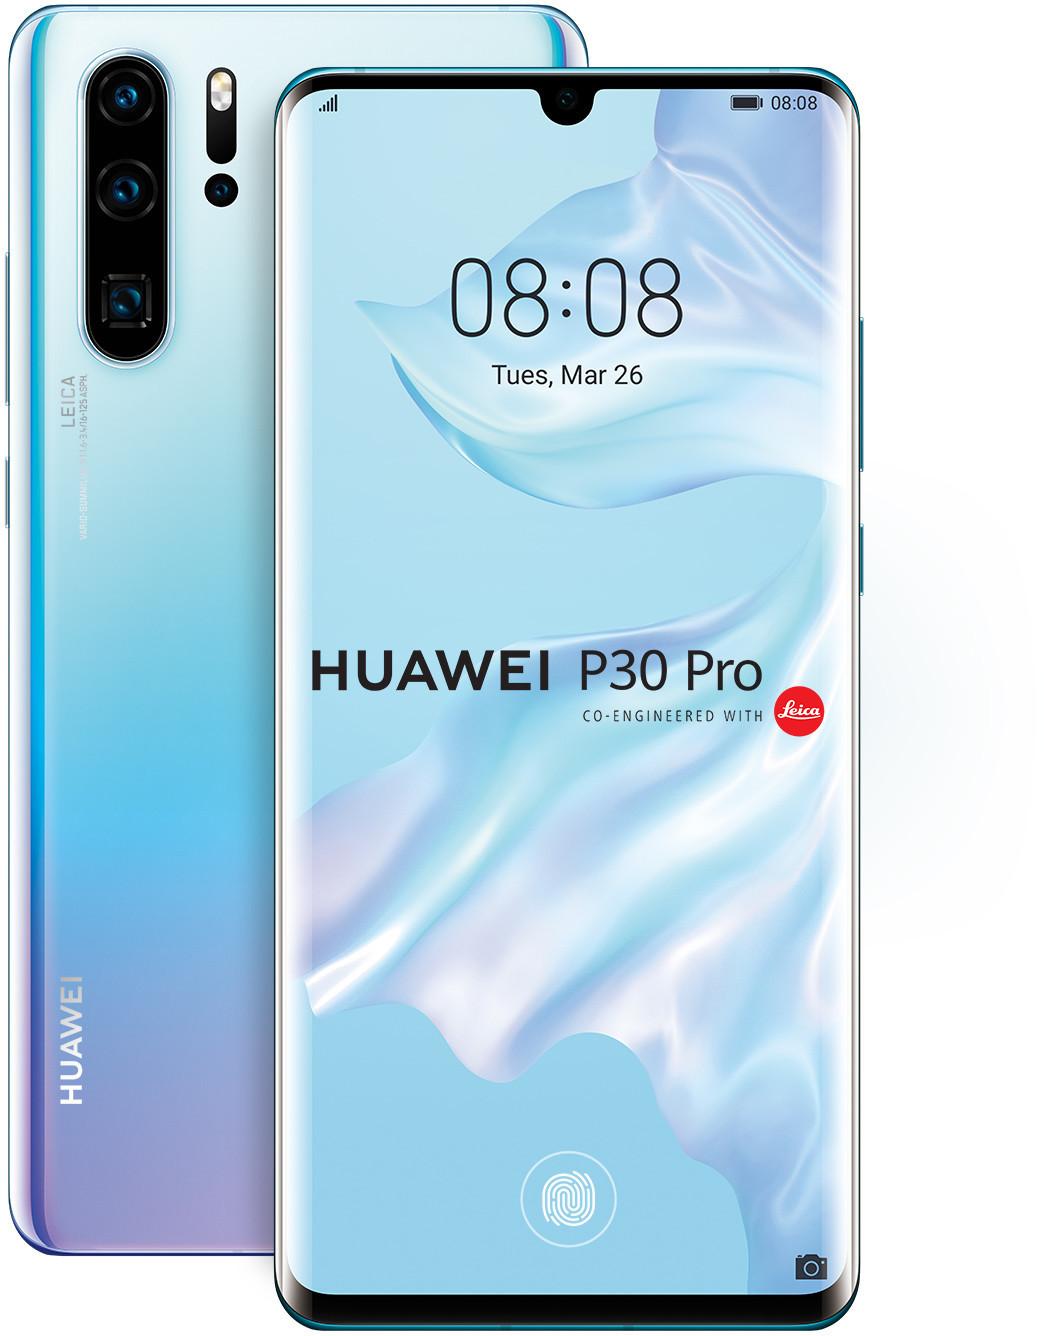 Image of Huawei P30 Pro 8GB 256GB Breathing Crystal